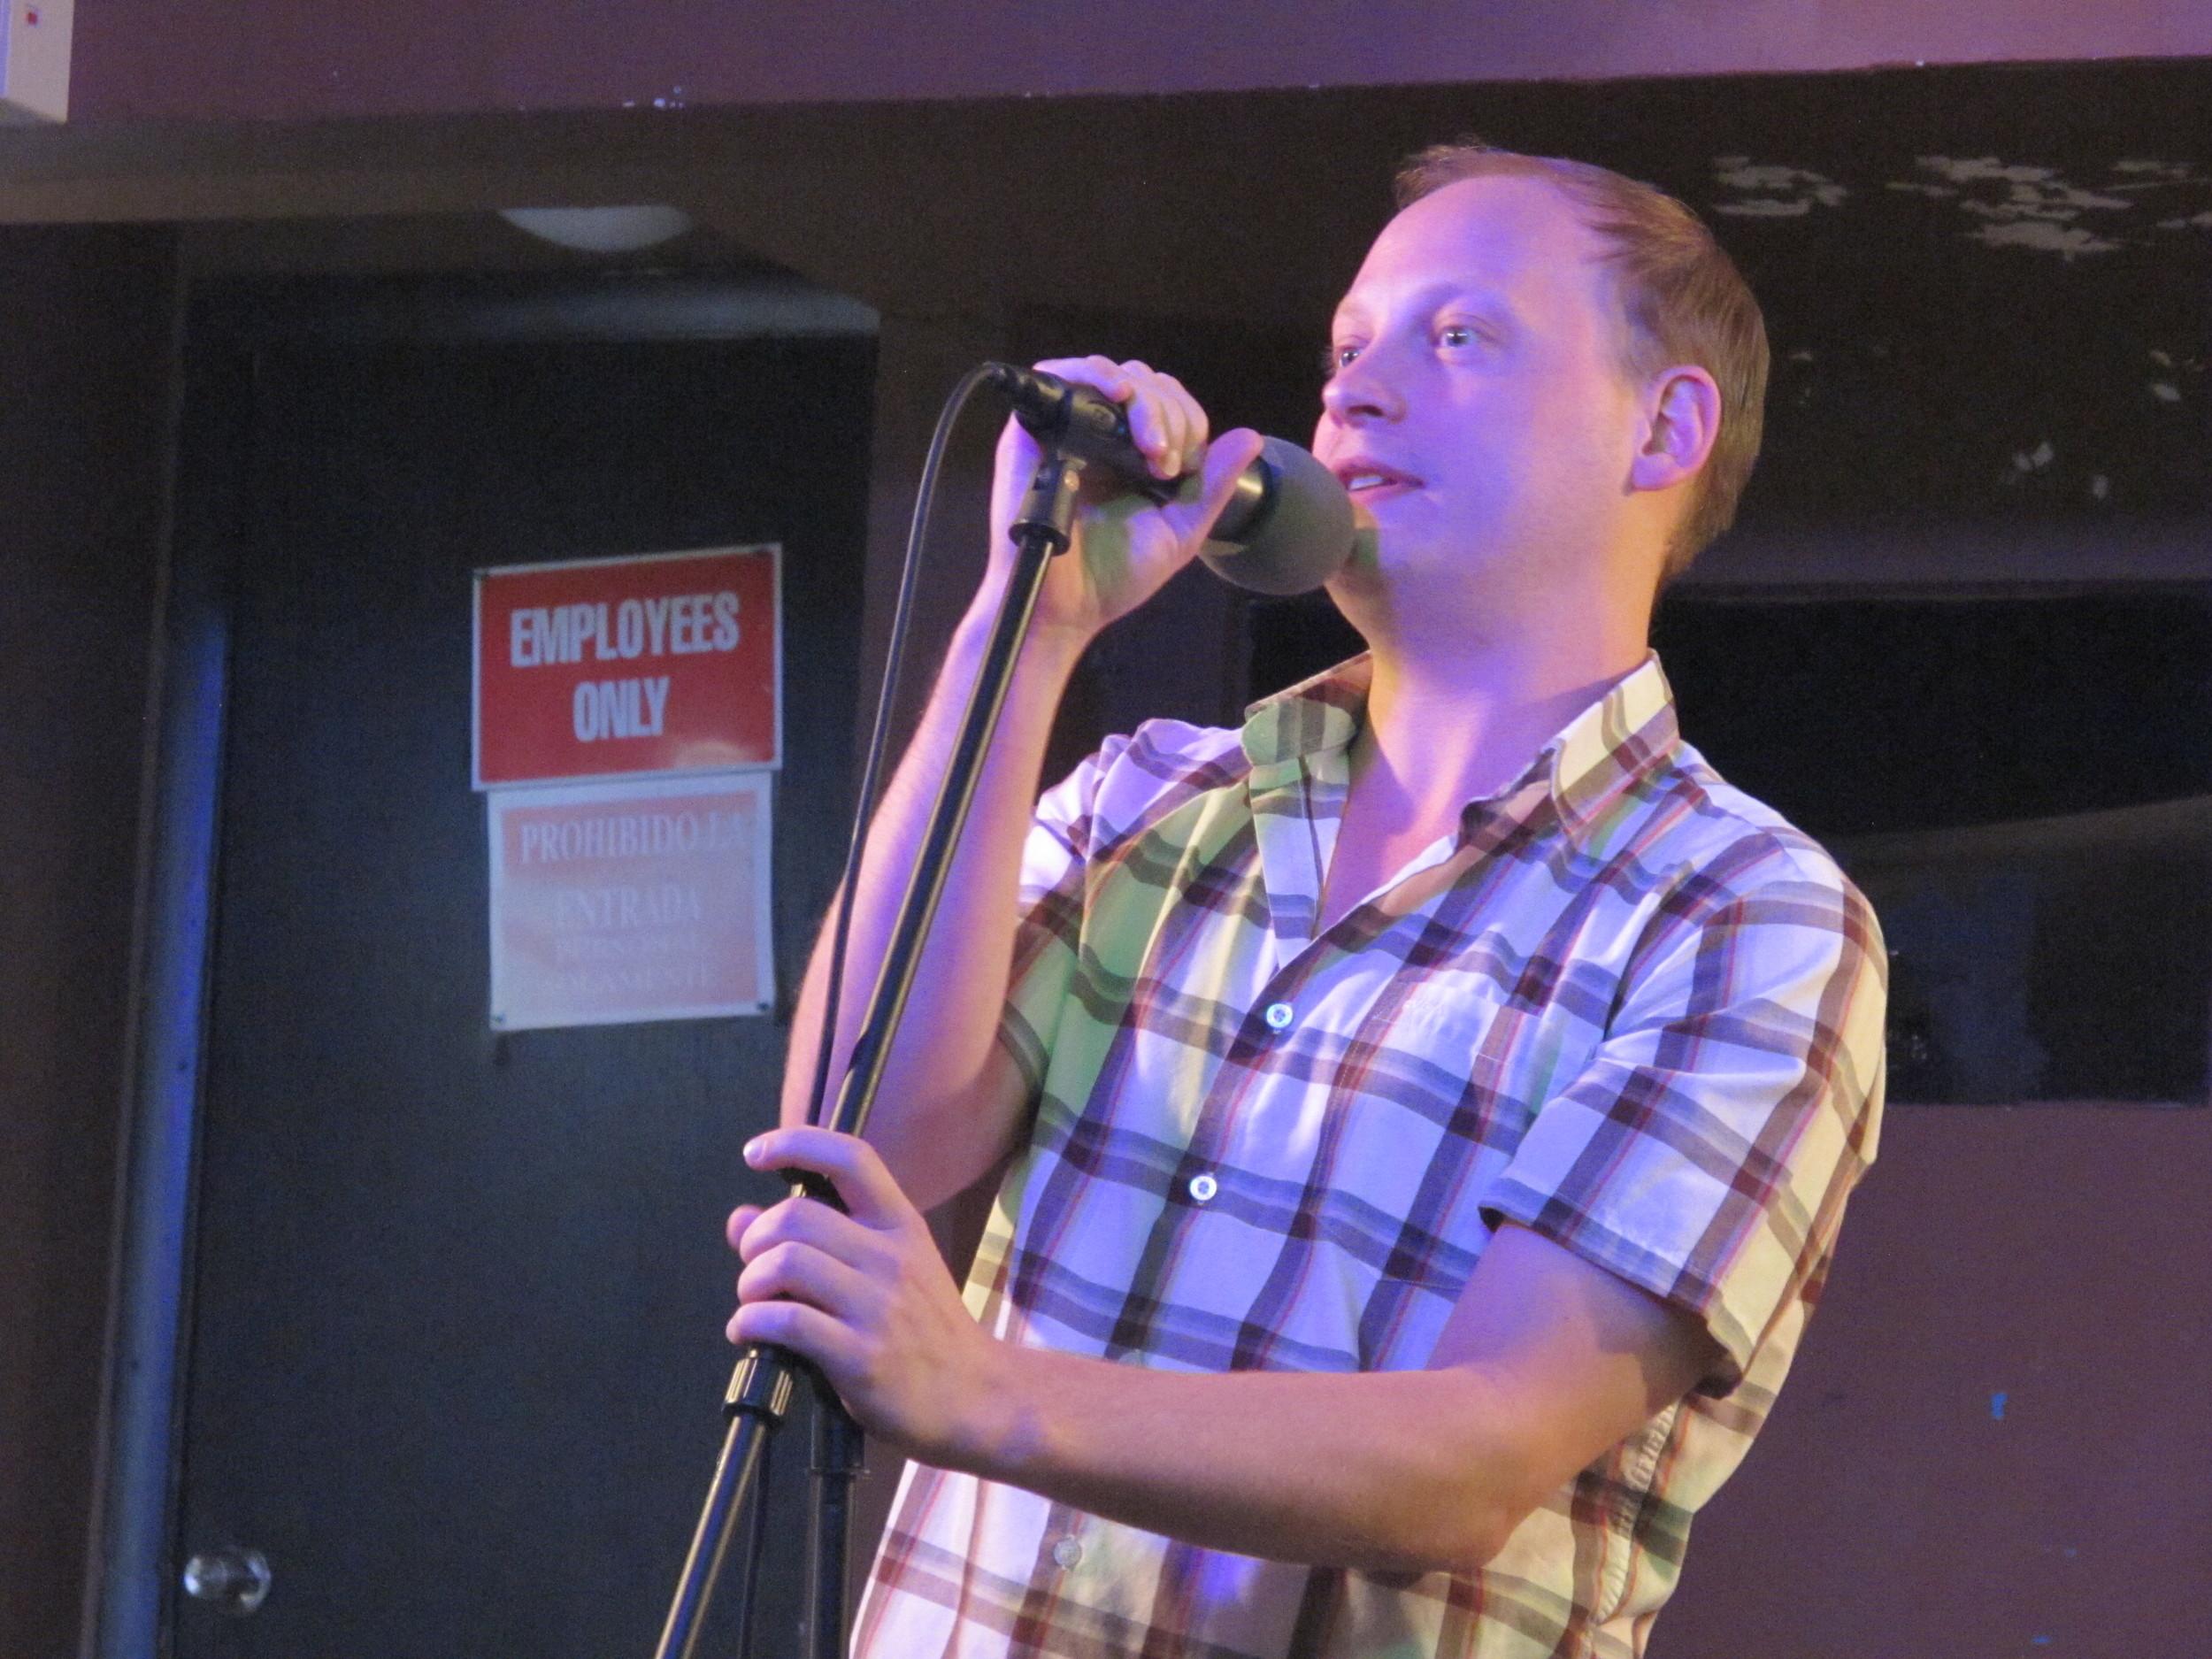 Brandon Fisher  rocks the mic right!